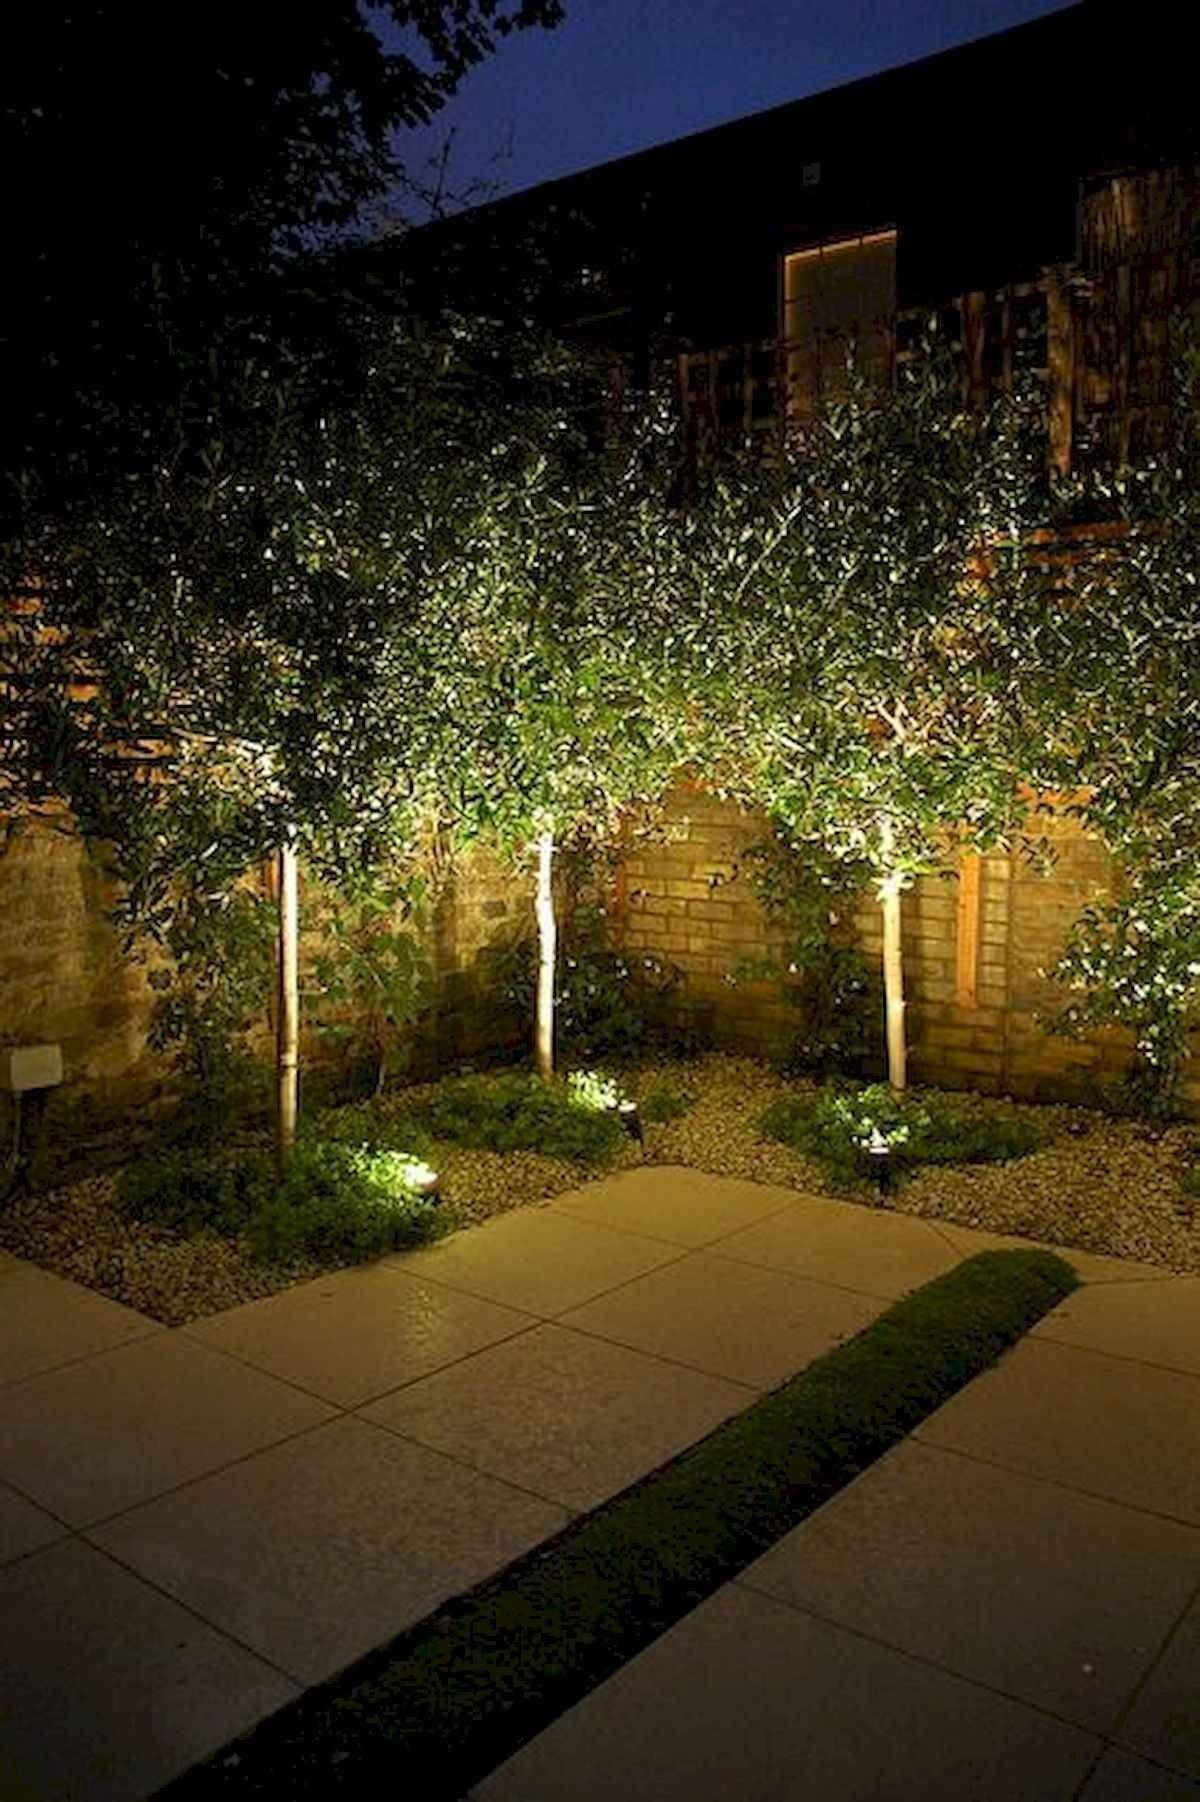 55 Stunning Garden Lighting Design Ideas And Remodel In 2020 Outdoor Landscape Lighting Garden Lighting Design Solar Landscape Lighting